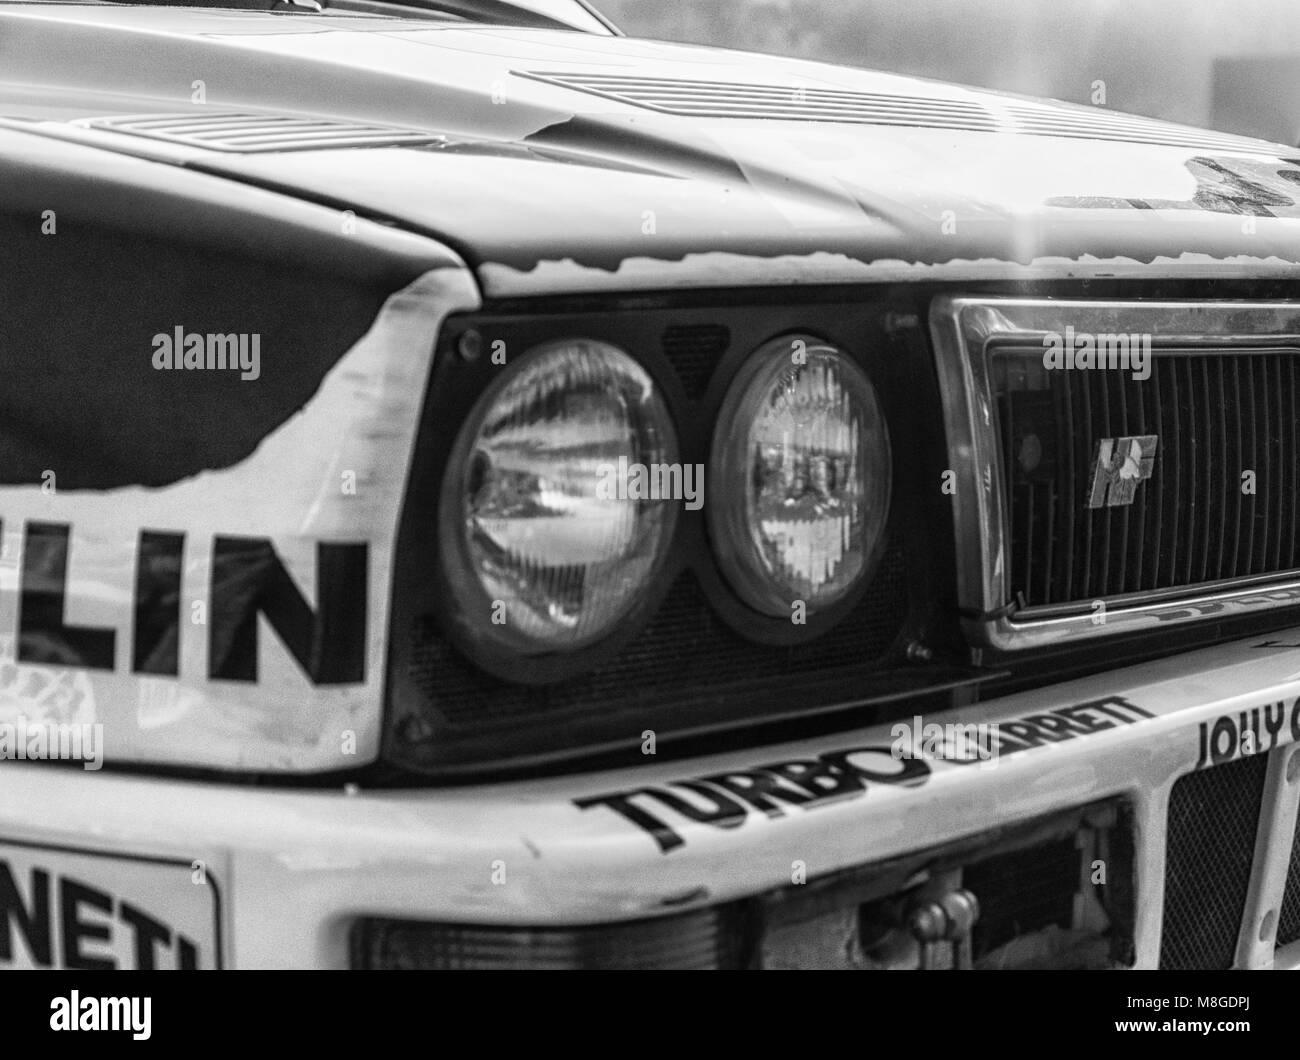 SANMARINO, SANMARINO - OTT 21, 2017 : LANCIA DELTA INT. 16V 1991 in old racing car rally THE LEGEND 2017 the famous - Stock Image